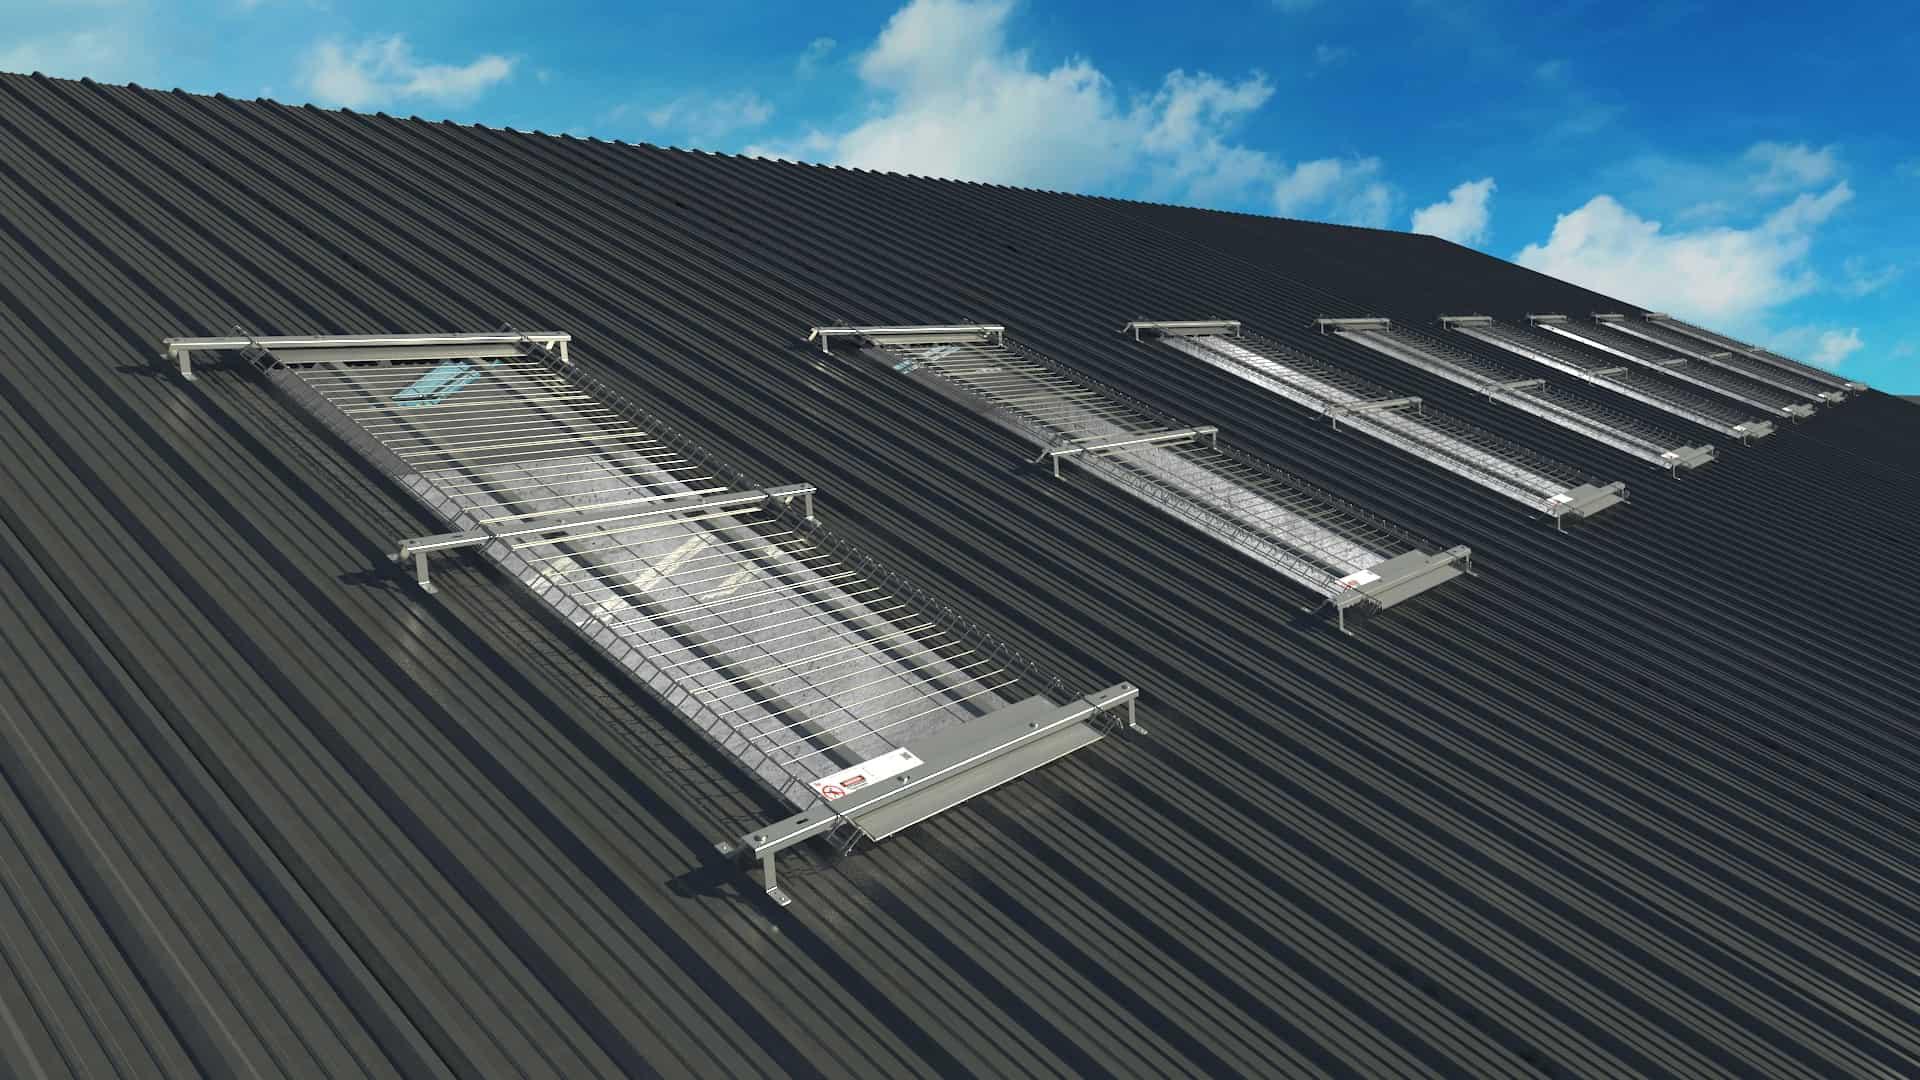 Skylight Roof Safety Protection Edge Protection Safety Net Fan Fall Arrest UAE DUbai Saudi Arabia Kuwait qatar Oman Bahrain SHarjah Abu dhabi Egypt TSS Total Safety SOlution